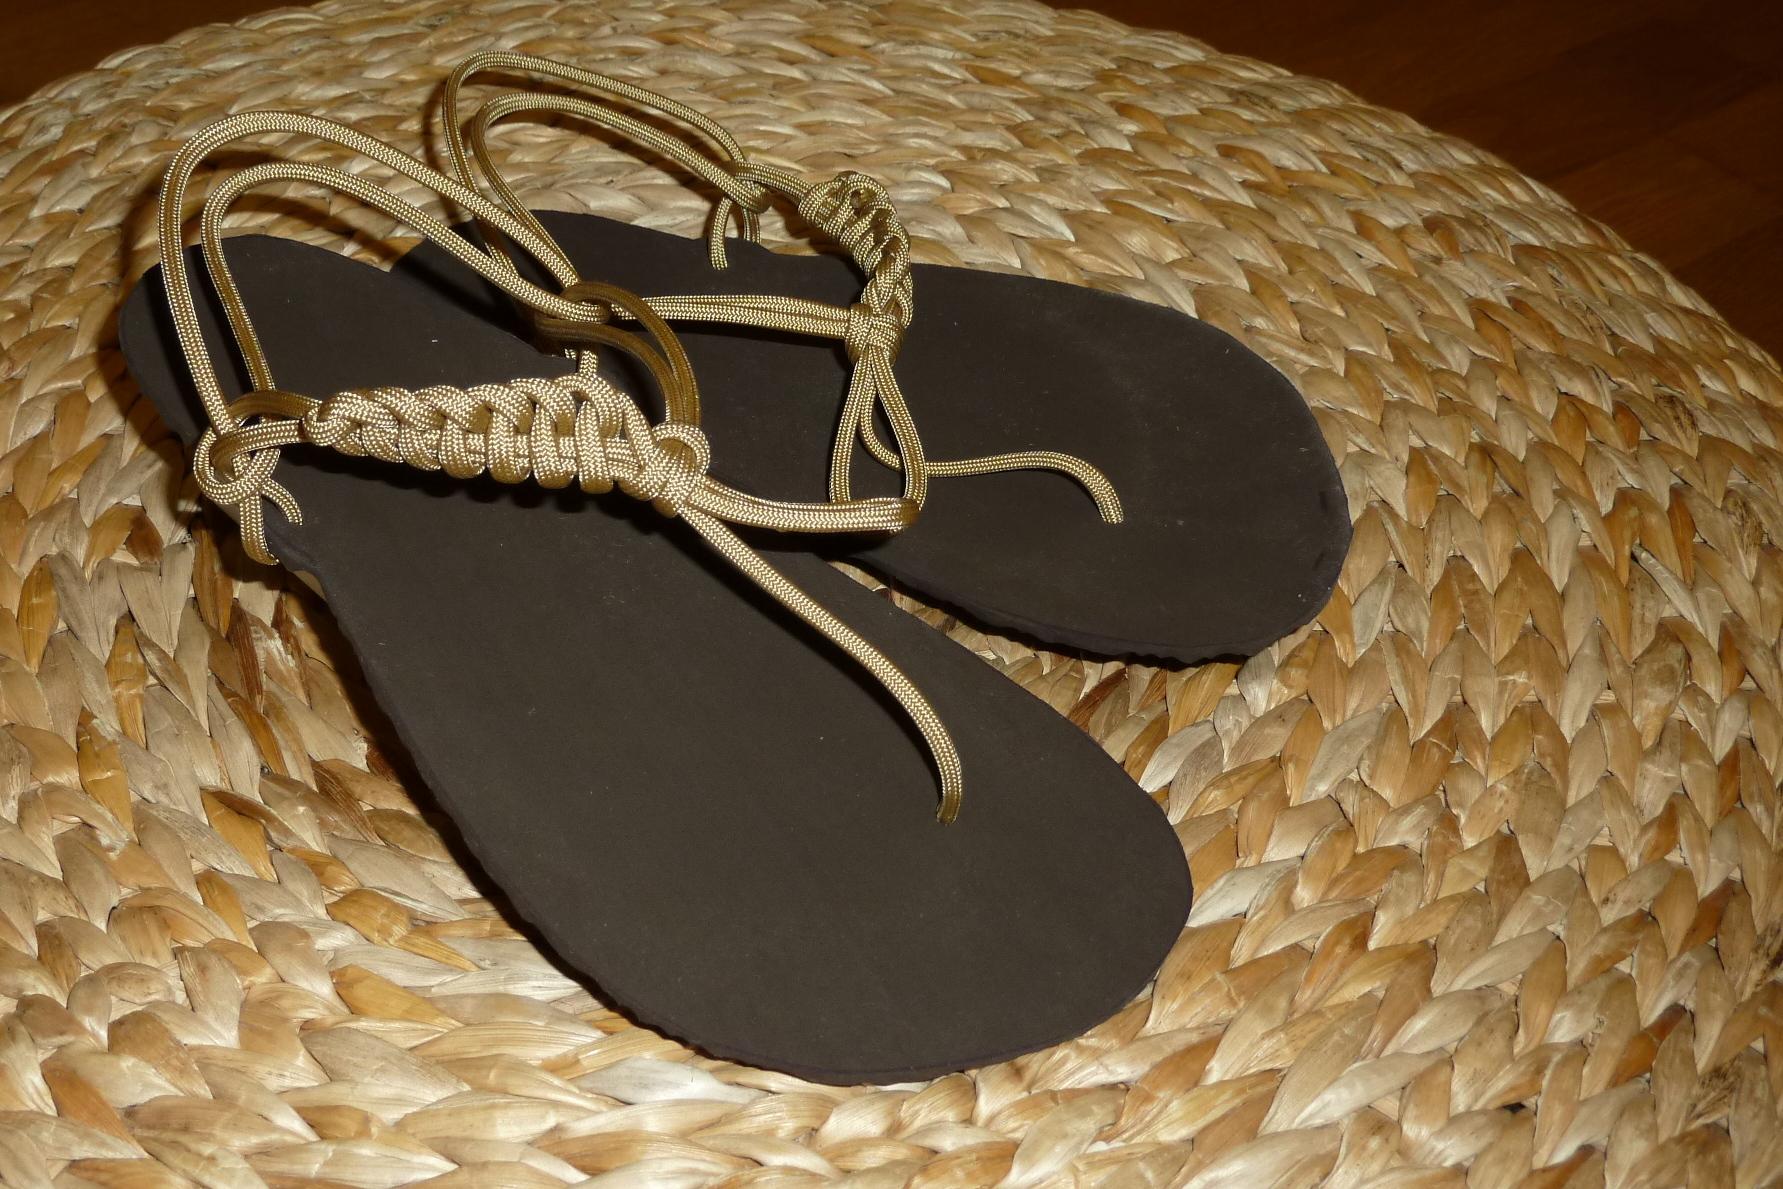 Barefoot sandály súvazem Classic